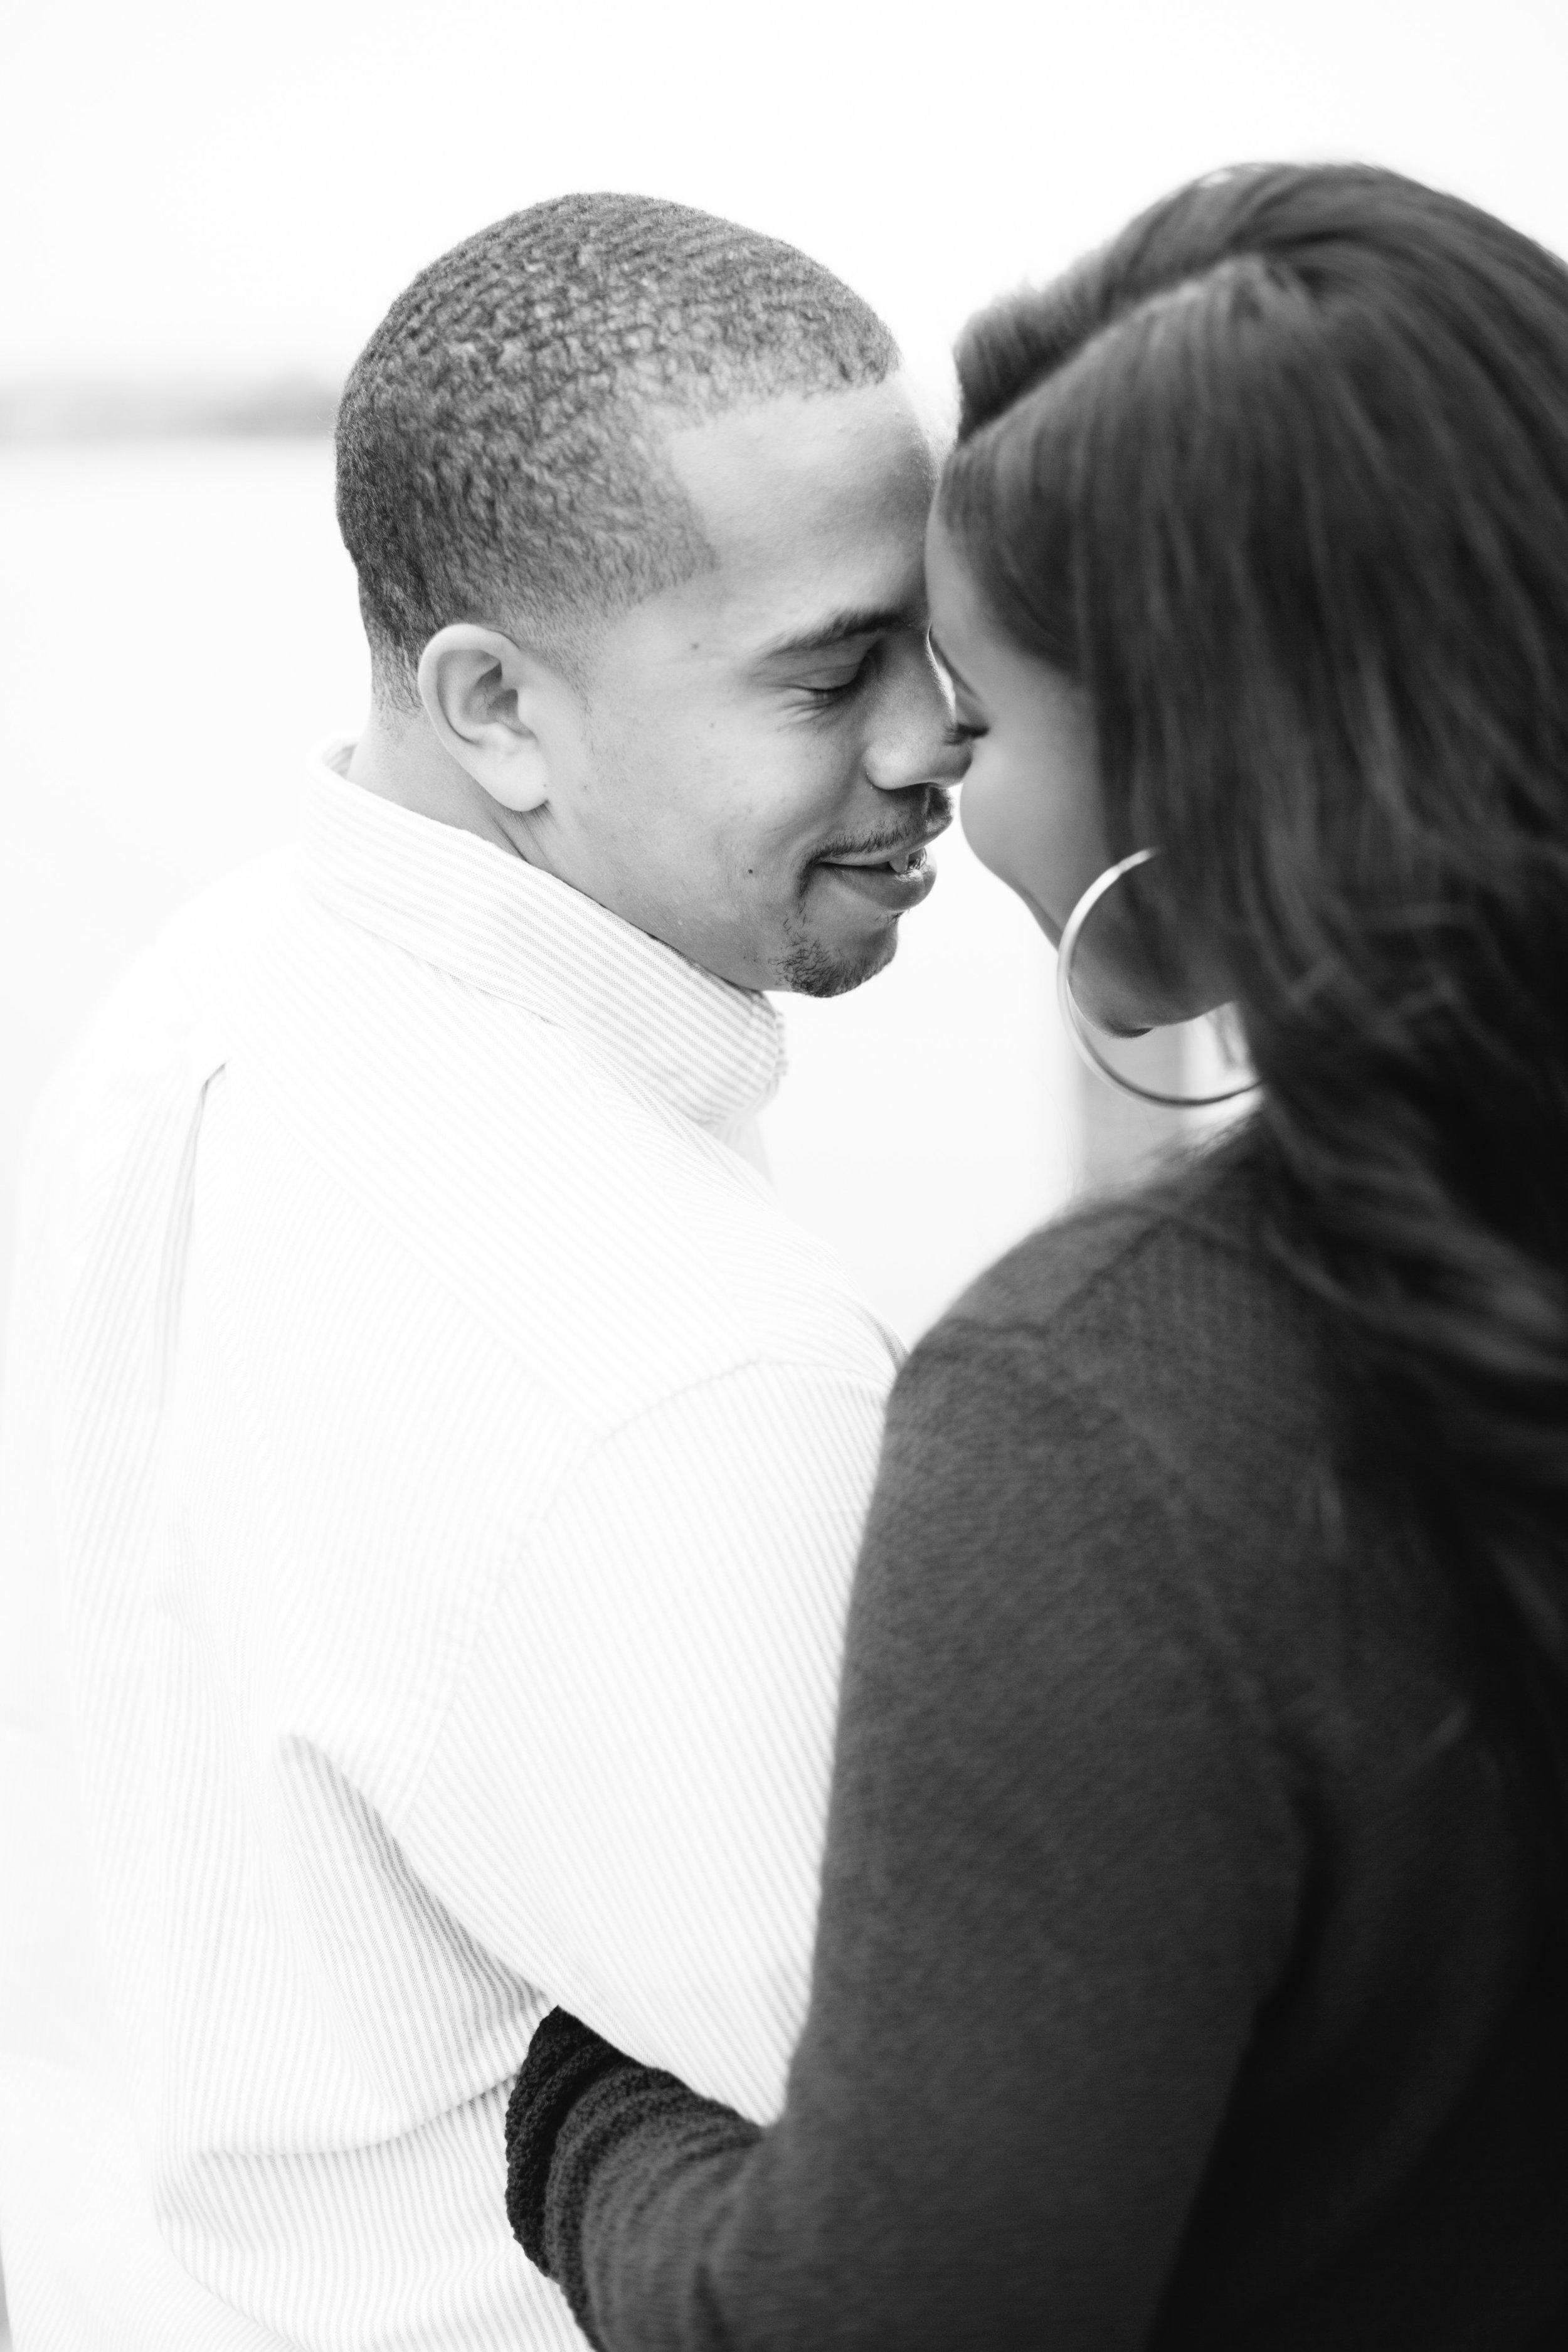 Shane and Aaliyah-Shane and Aaliyah-0030.jpg